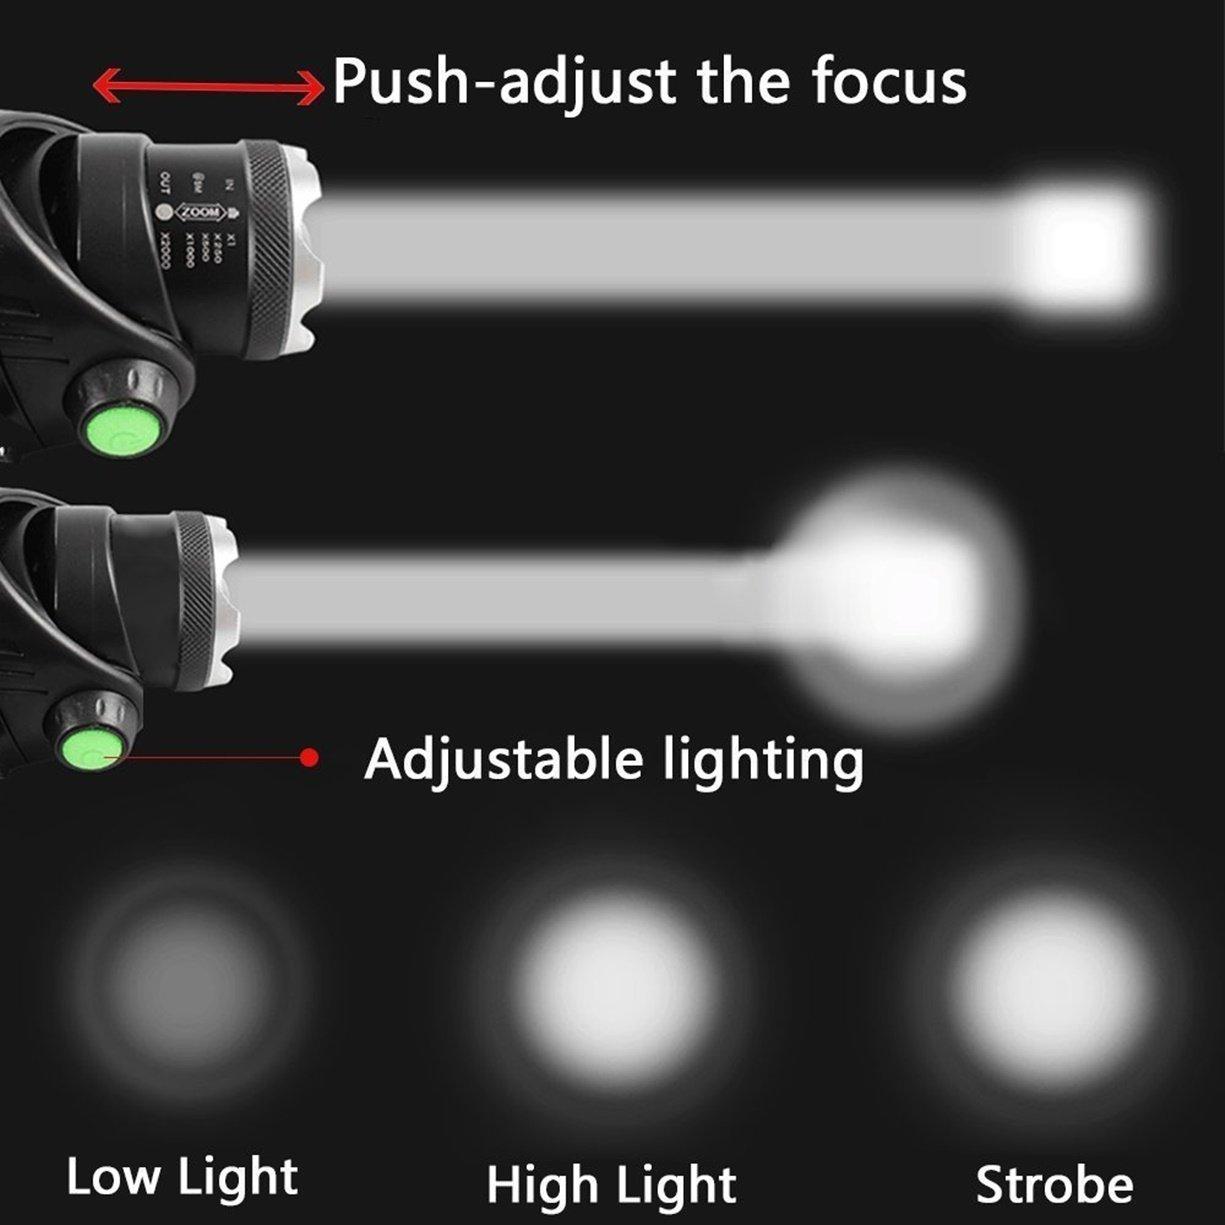 1 Pc 5000 Lumens Cree Xm L T6 Led Headlamp 3 Mode Headlights 10w 6v Ultrabright Chaser Circuit Flashlight Headlight Rousing Fashionable Ultra Xtreme Tactical Bright Light Outdoor Running